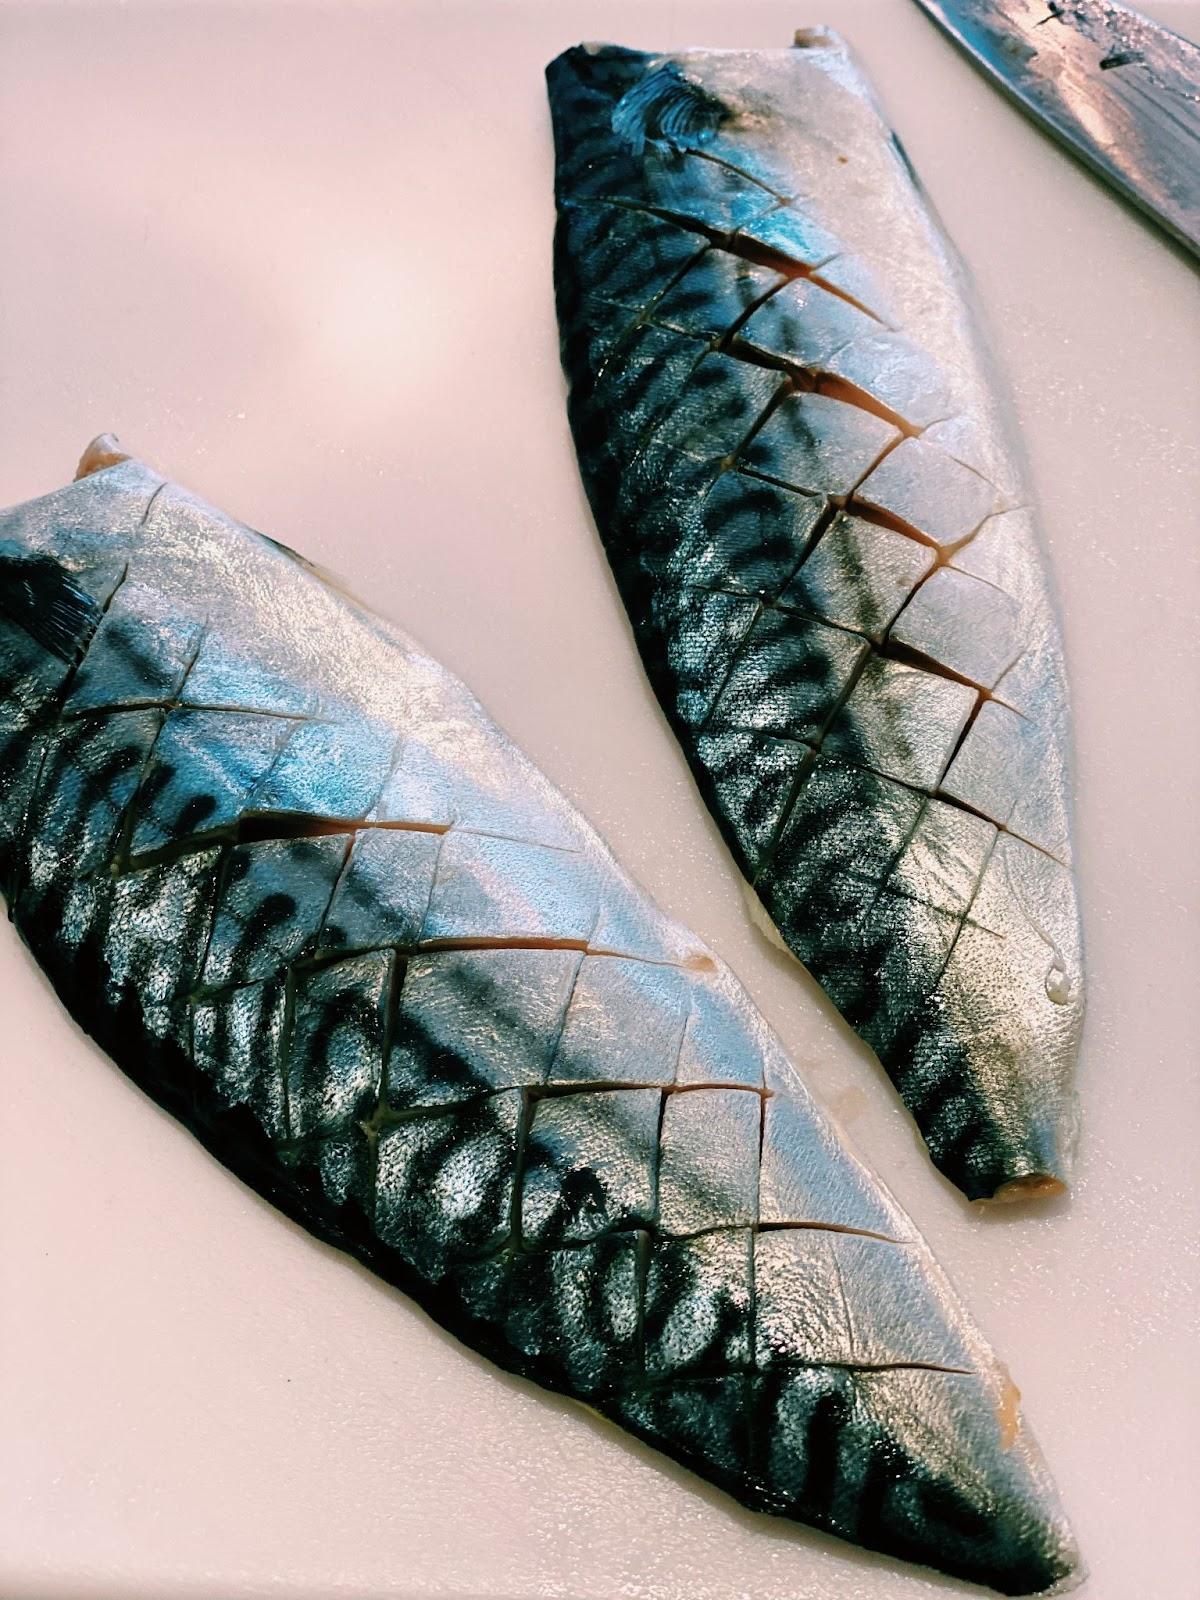 How to pan-fry asian fish